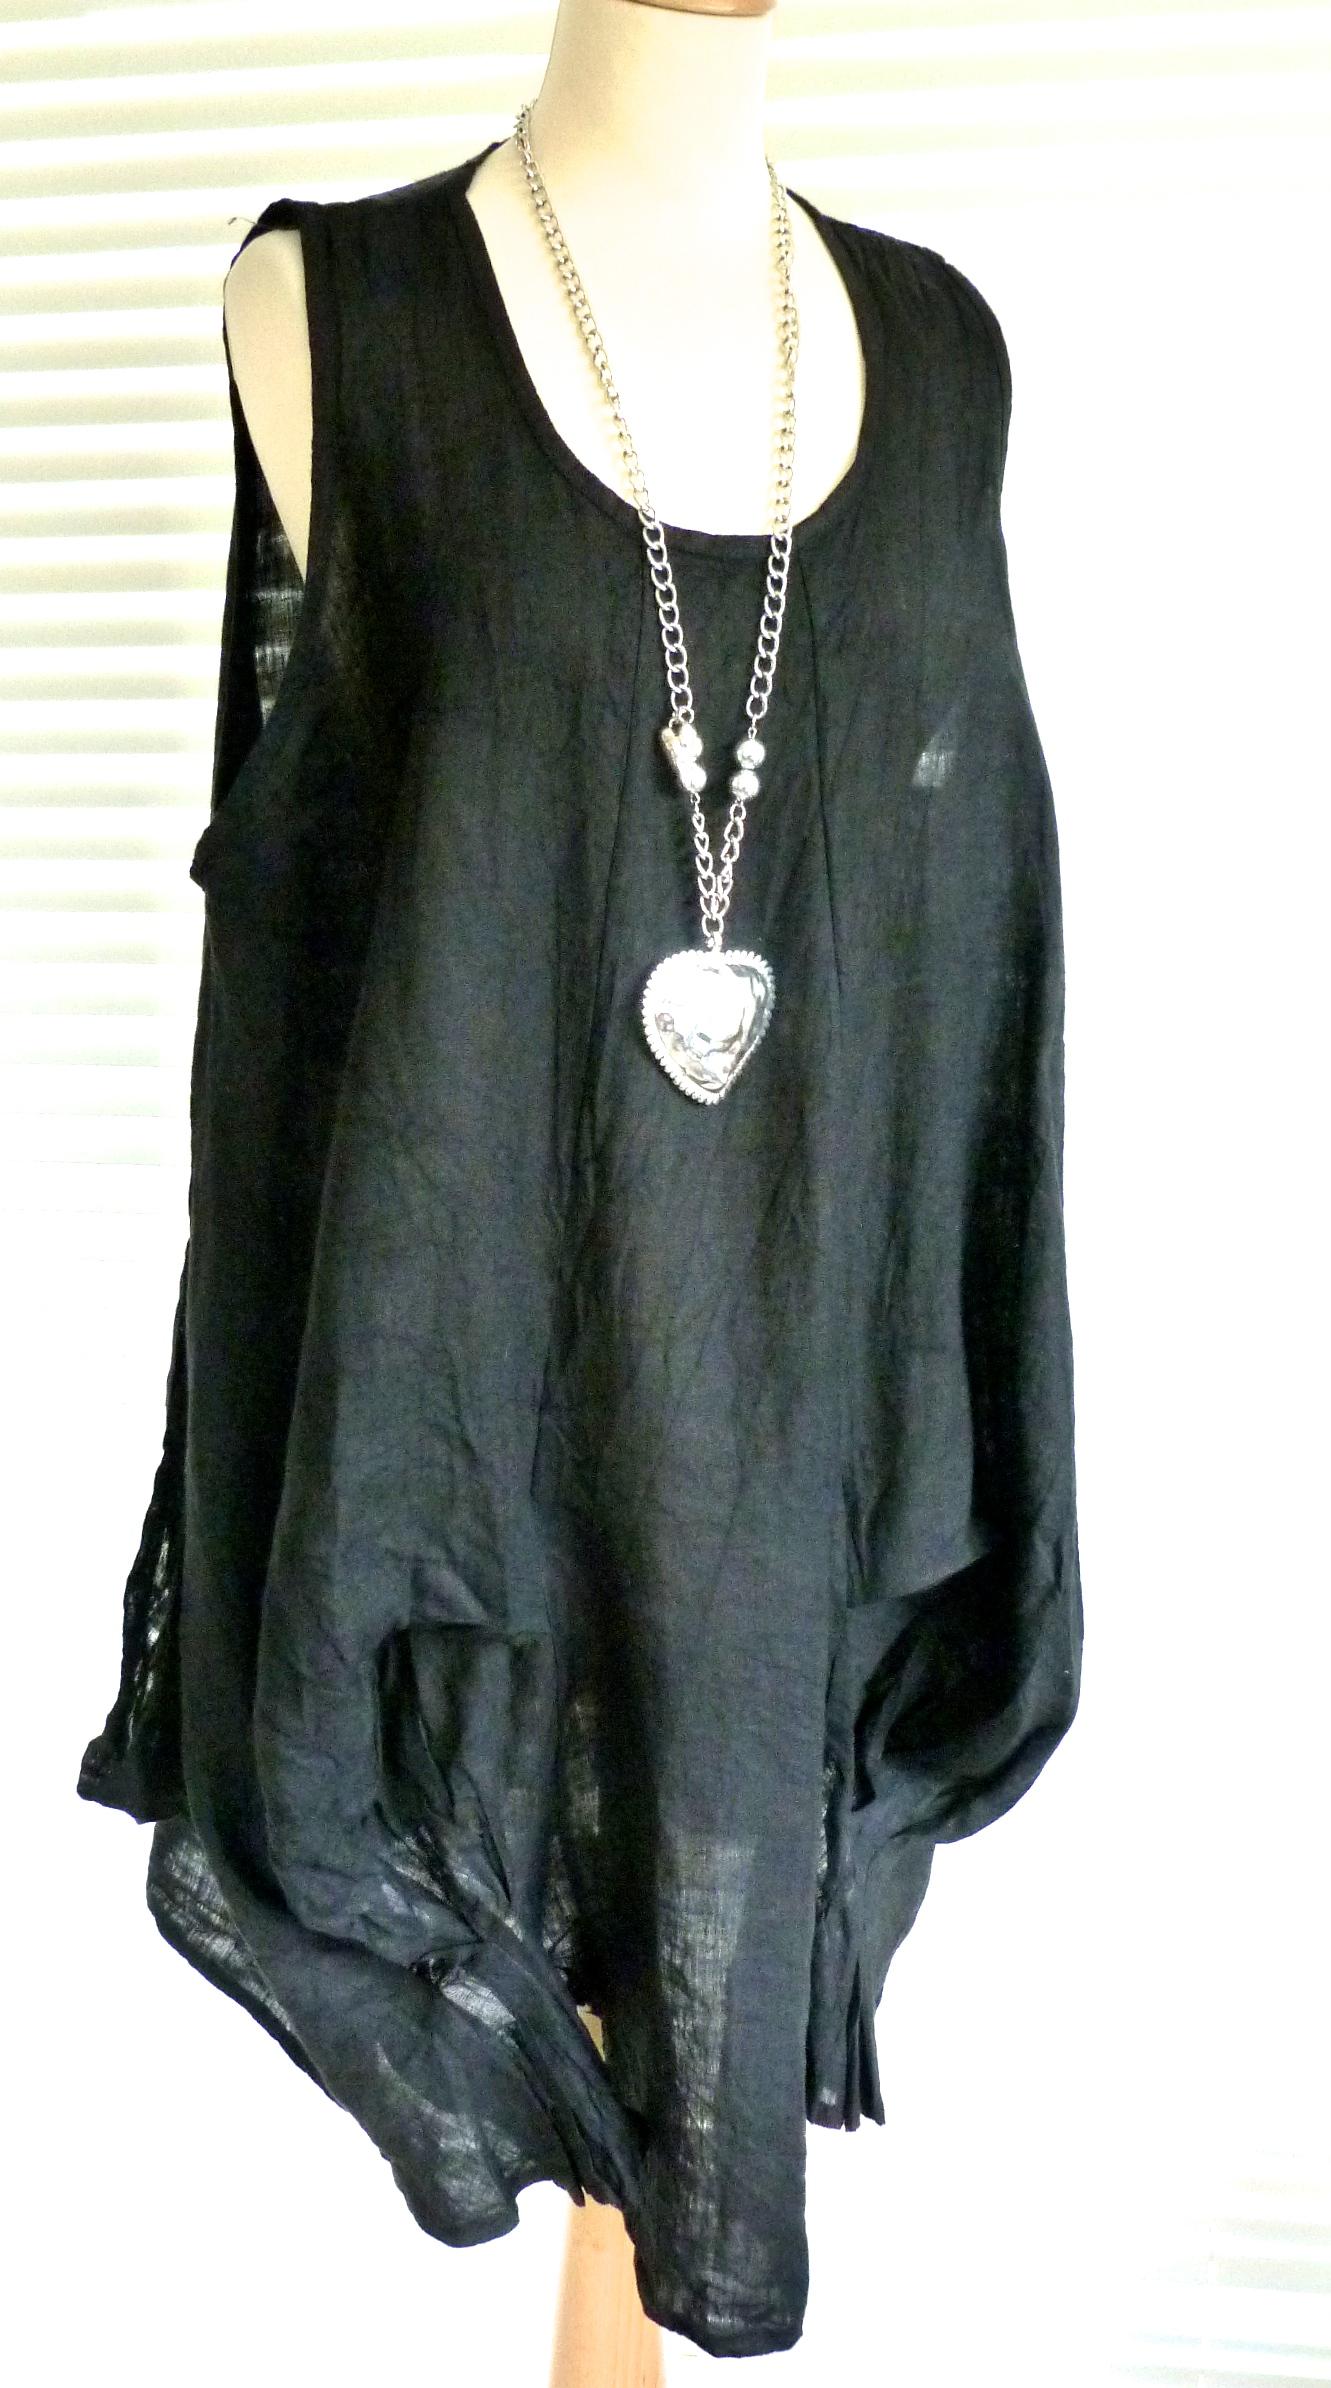 2196a8c512d Gorgeous Italian linen lagenlook tunic dress with quirky hemline - Janie